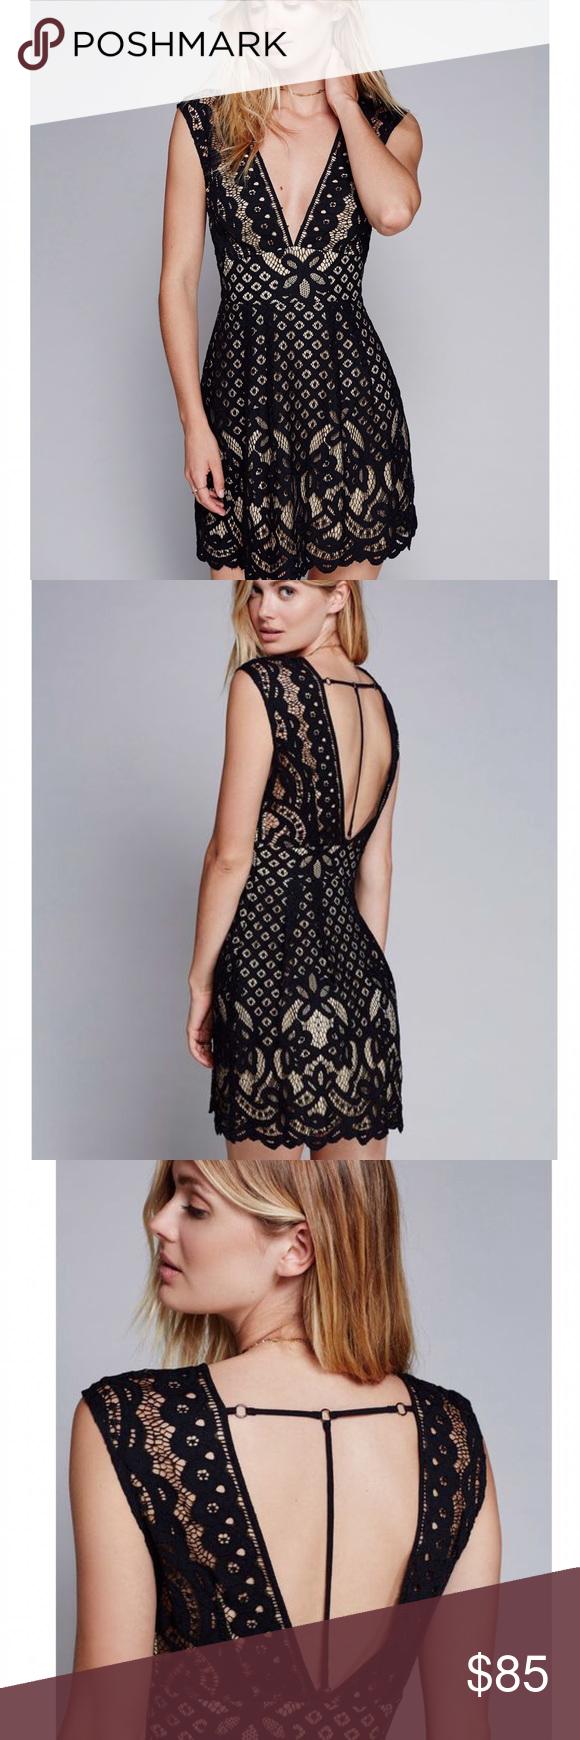 20c50df9e9ef Free People Black Lace Mini Dress Free People s One Million Lovers Mini  Dress. Black lace overlay